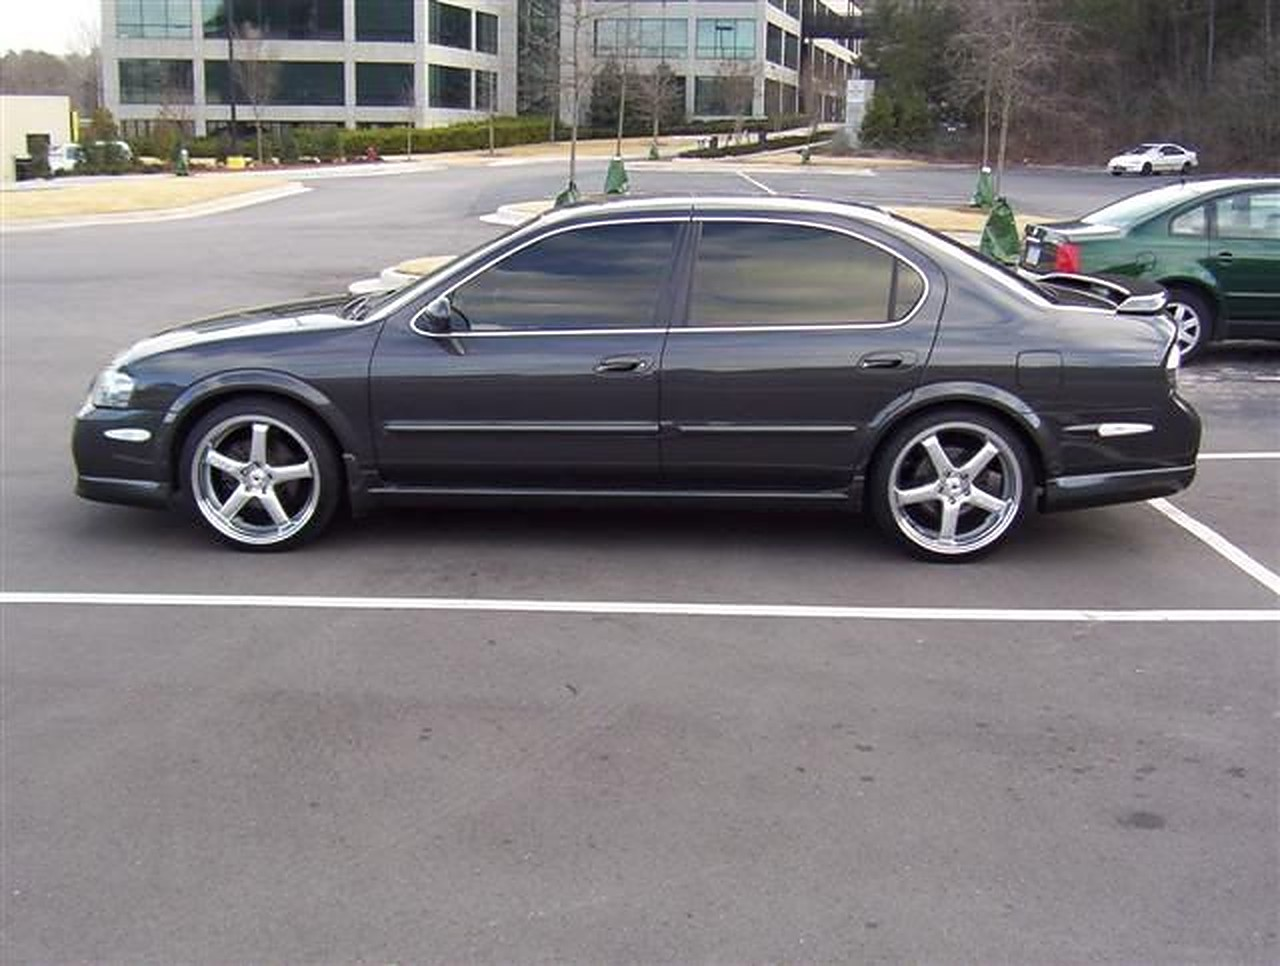 New Rear Brake Calipers Fit 2000 2001 Nissan Sentra 99 00 01 Infiniti G20 {PAIR}